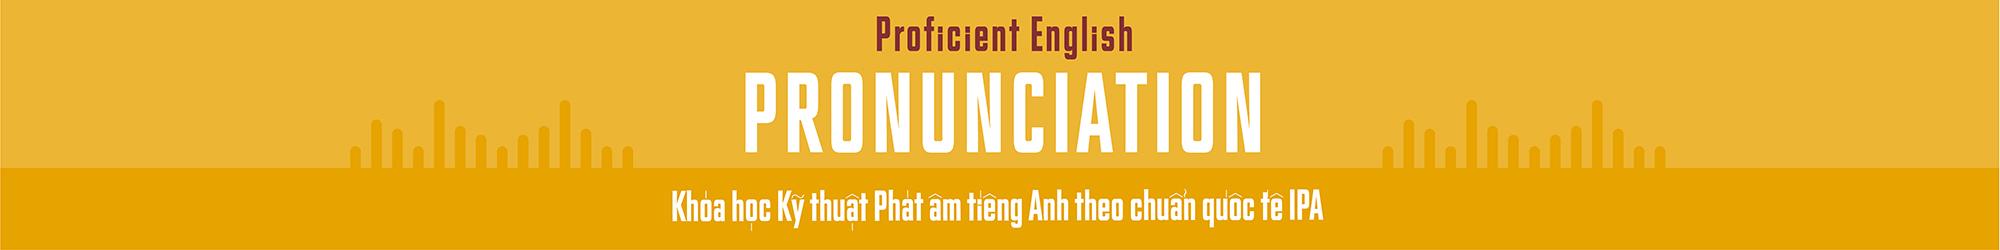 Proficient Pronunciation banner